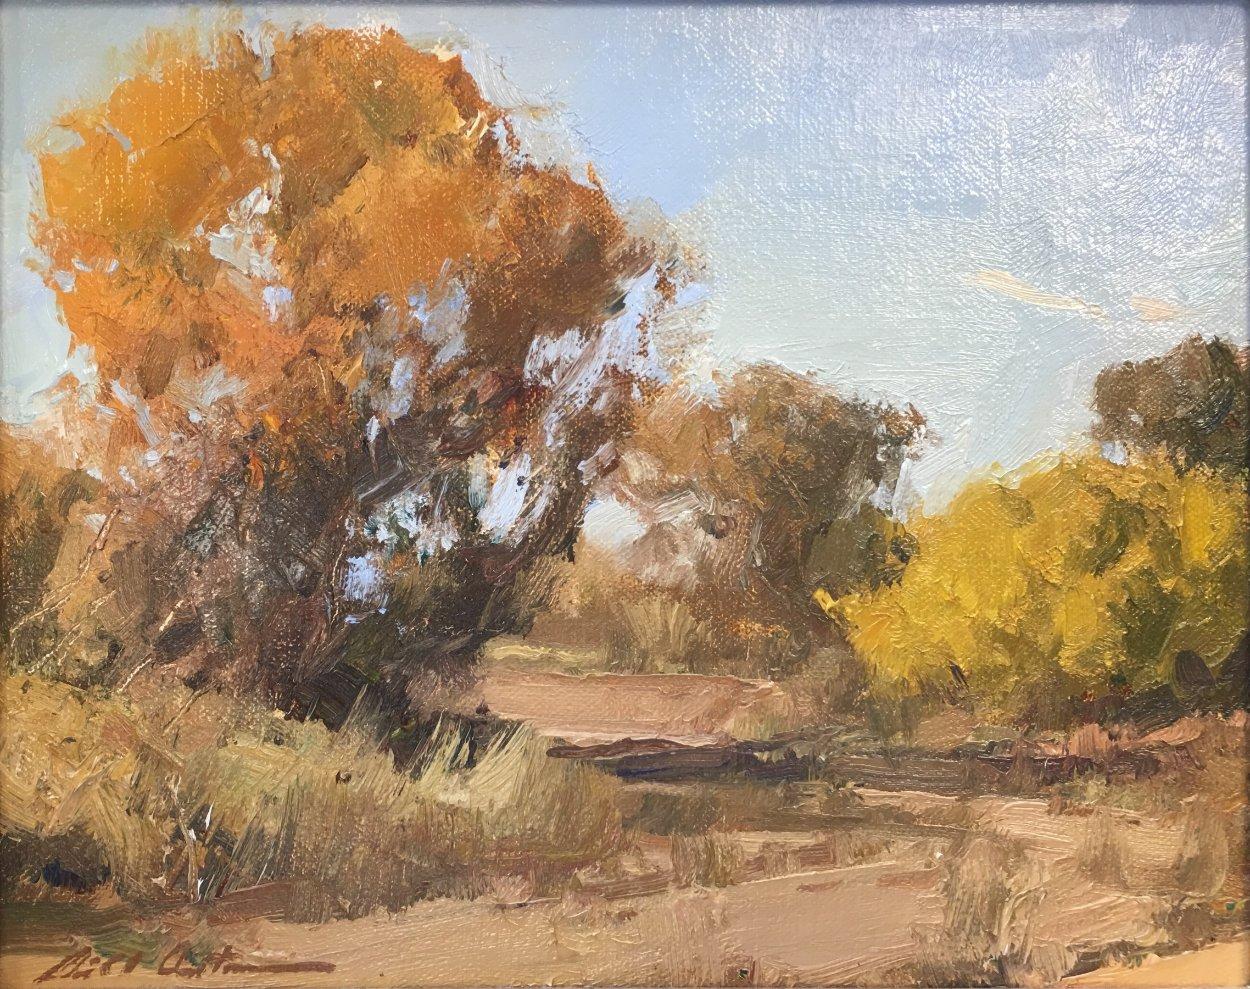 Autumn At Mint Wash 2011 13x15 Arizona Original Painting by Bill Anton